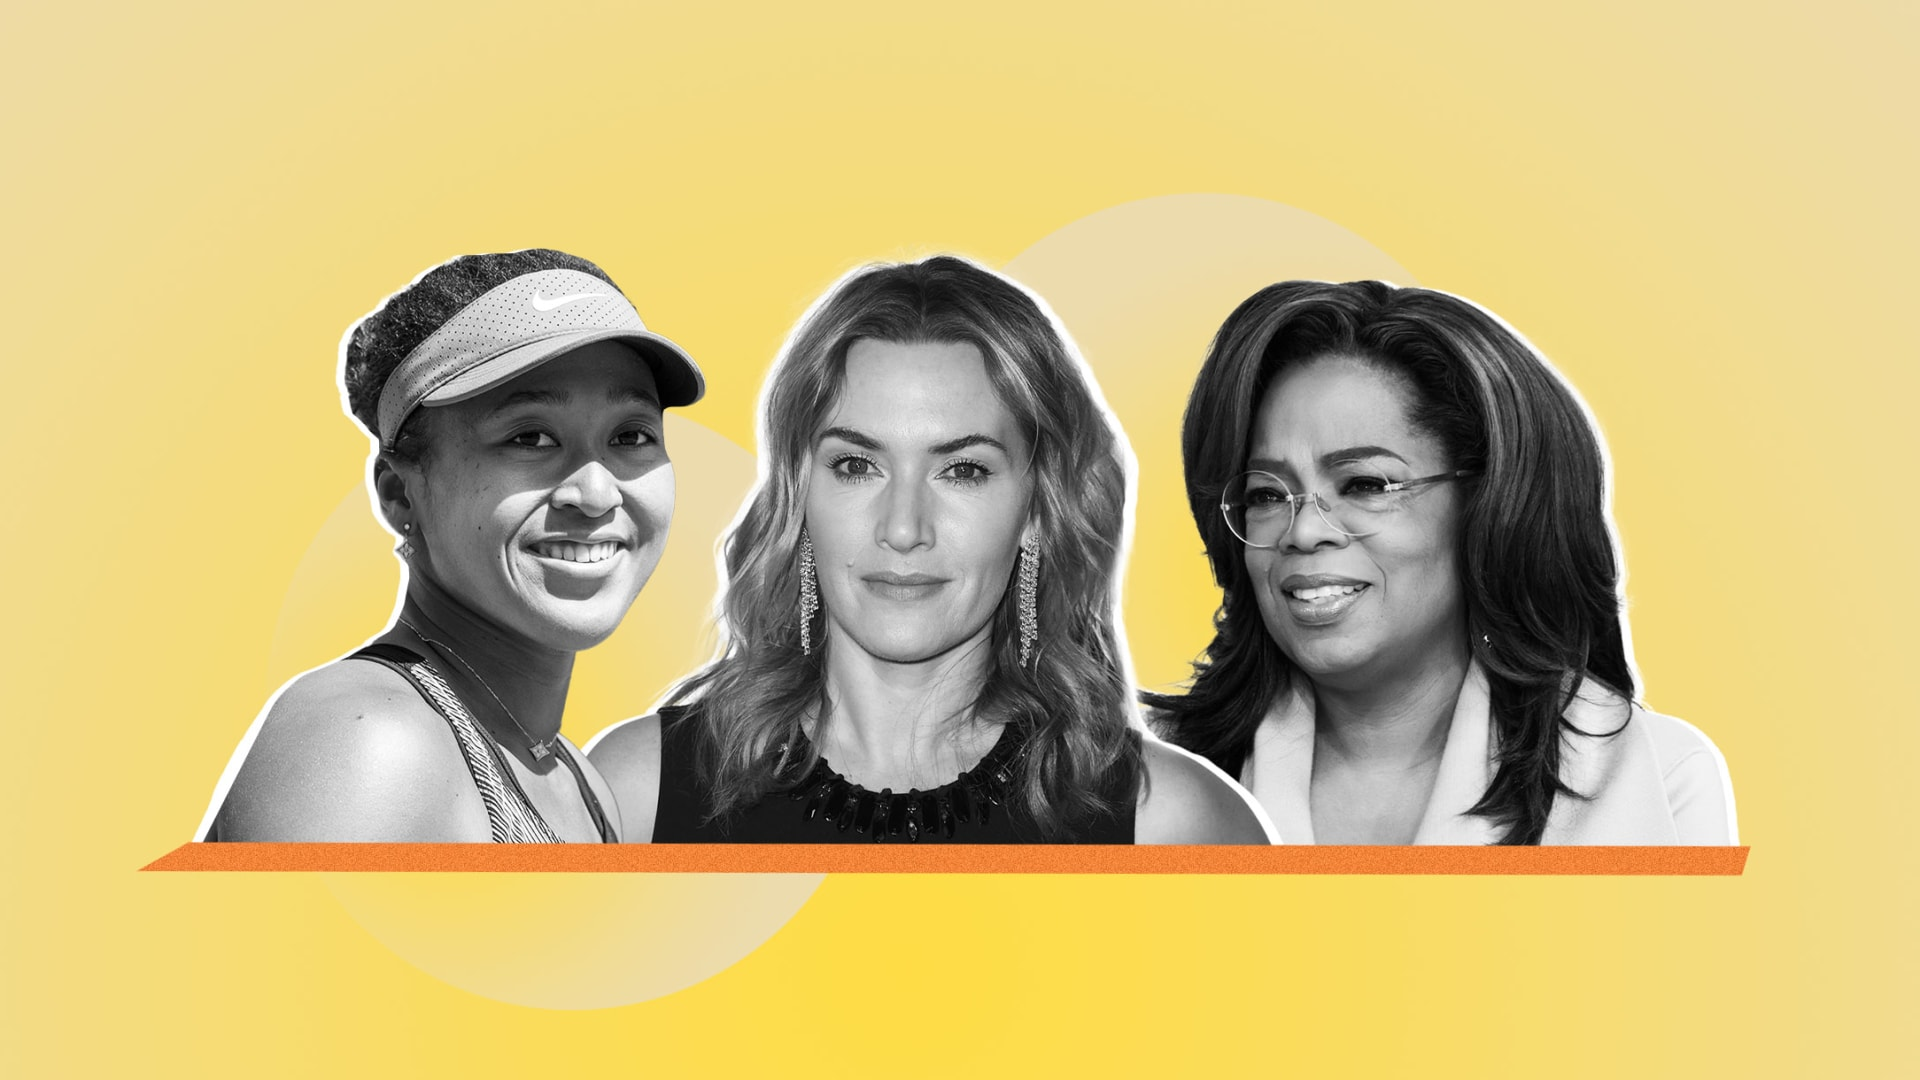 From left: Naomi Osaka, Kate Winslet, and Oprah Winfrey.